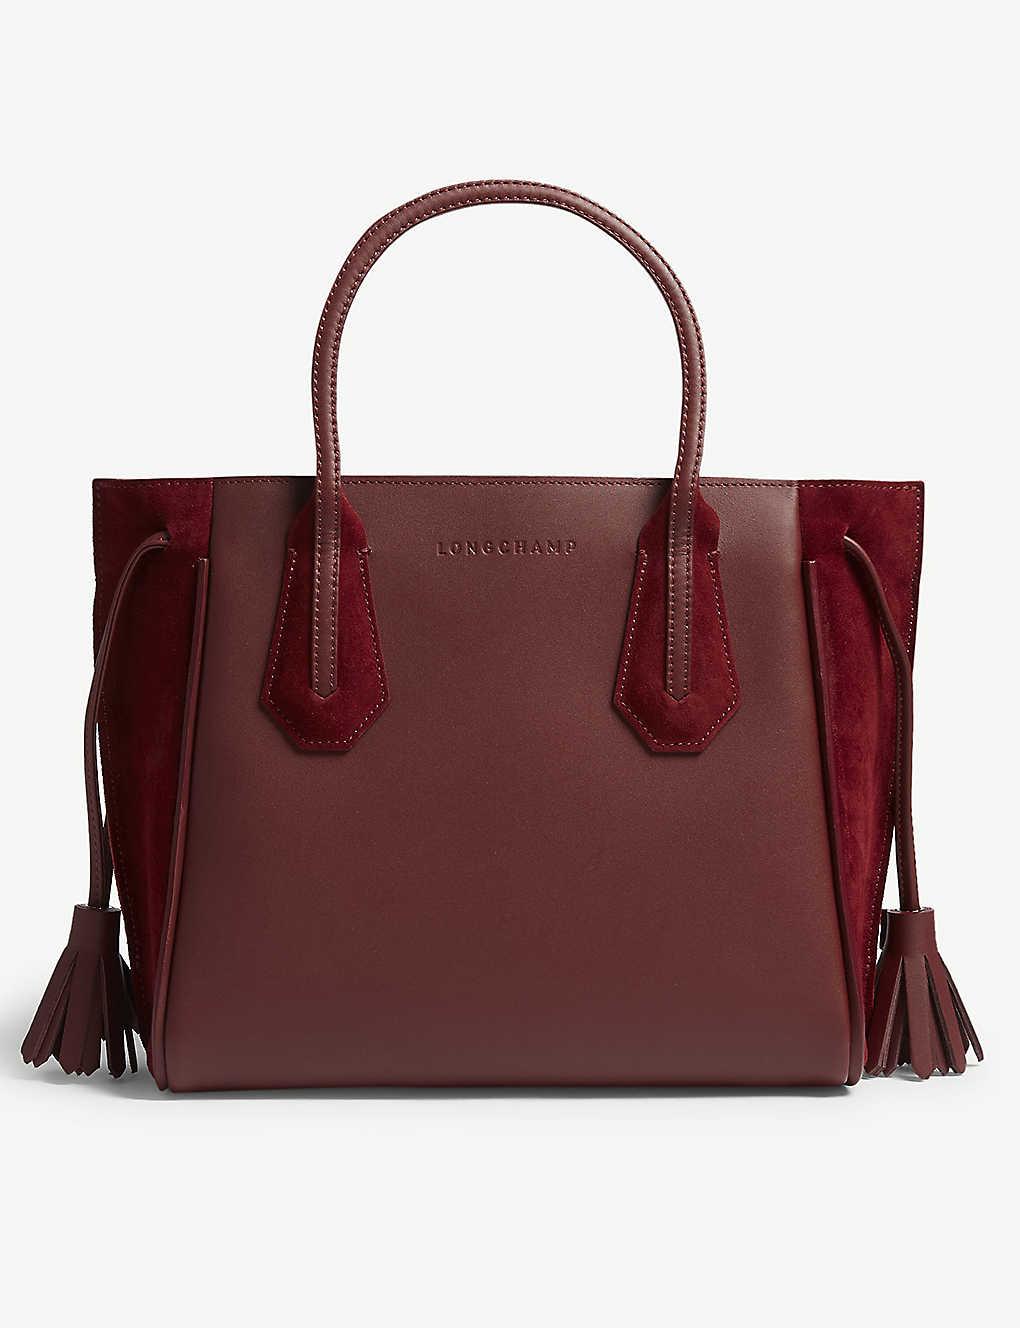 67ca82a6d4 LONGCHAMP - Pénélope soft leather and suede tote small   Selfridges.com